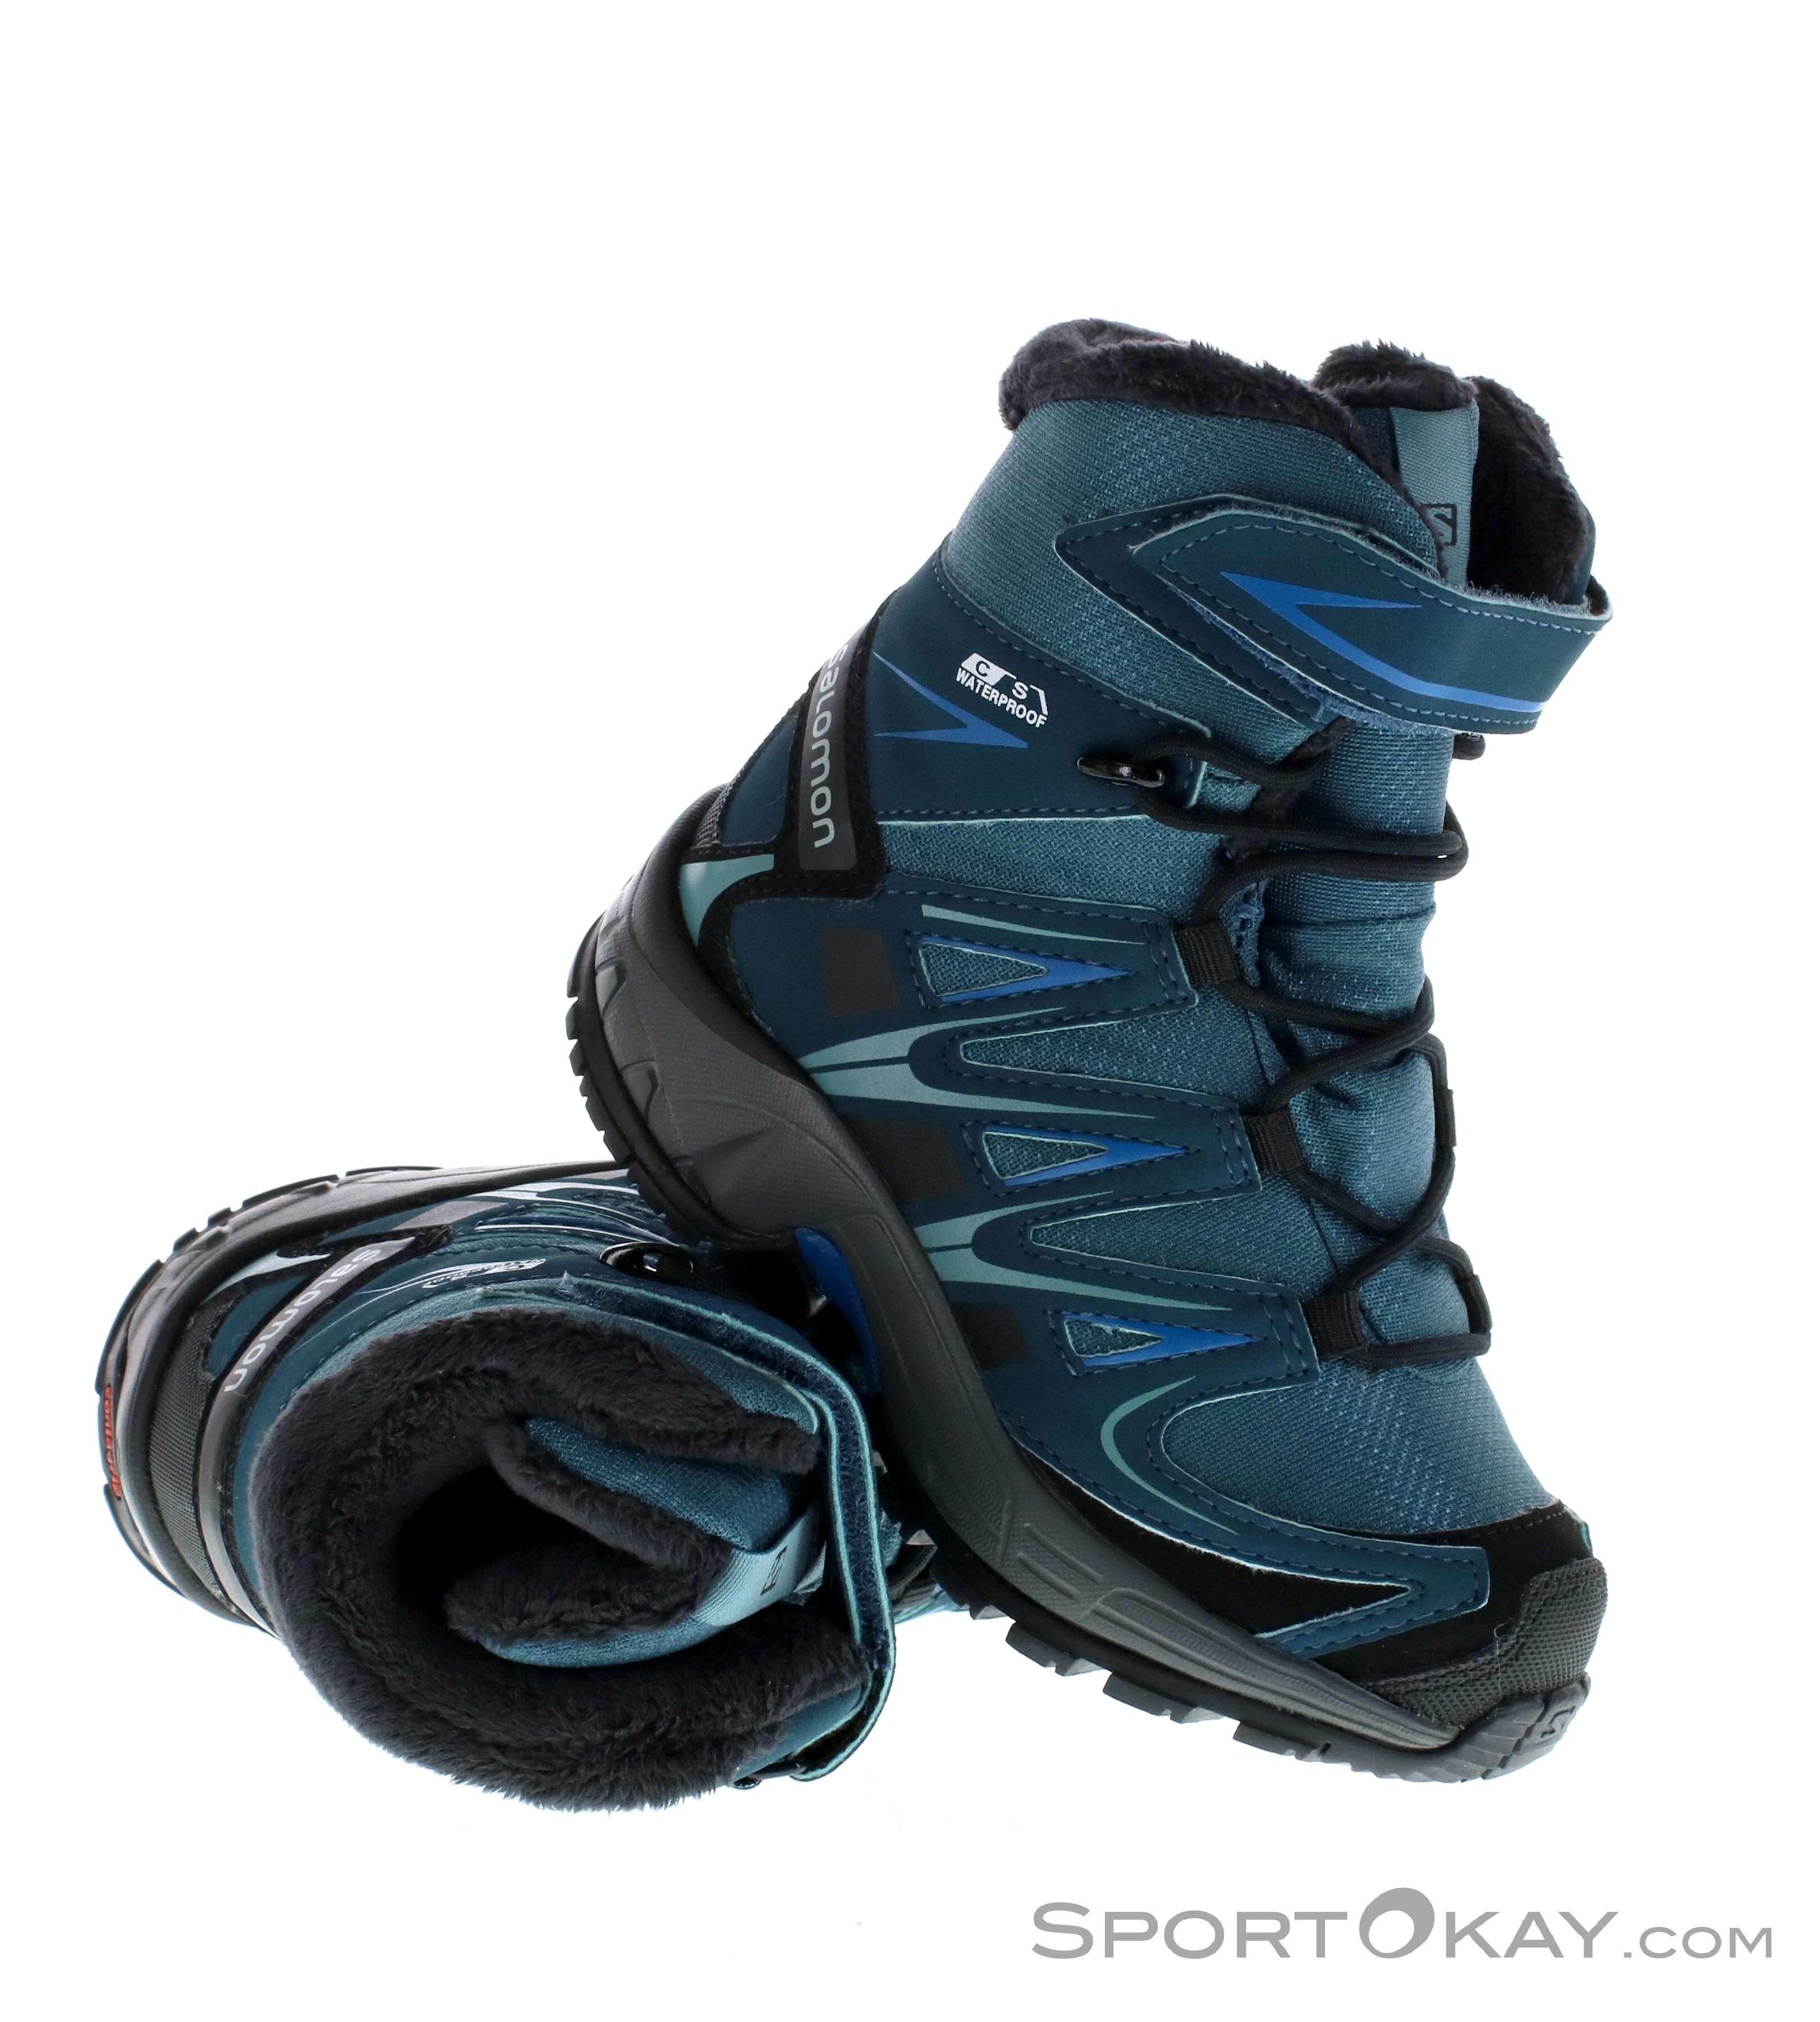 Salomon Salomon XA Pro 3D Winter TS CSWP Jugend Wanderschuhe